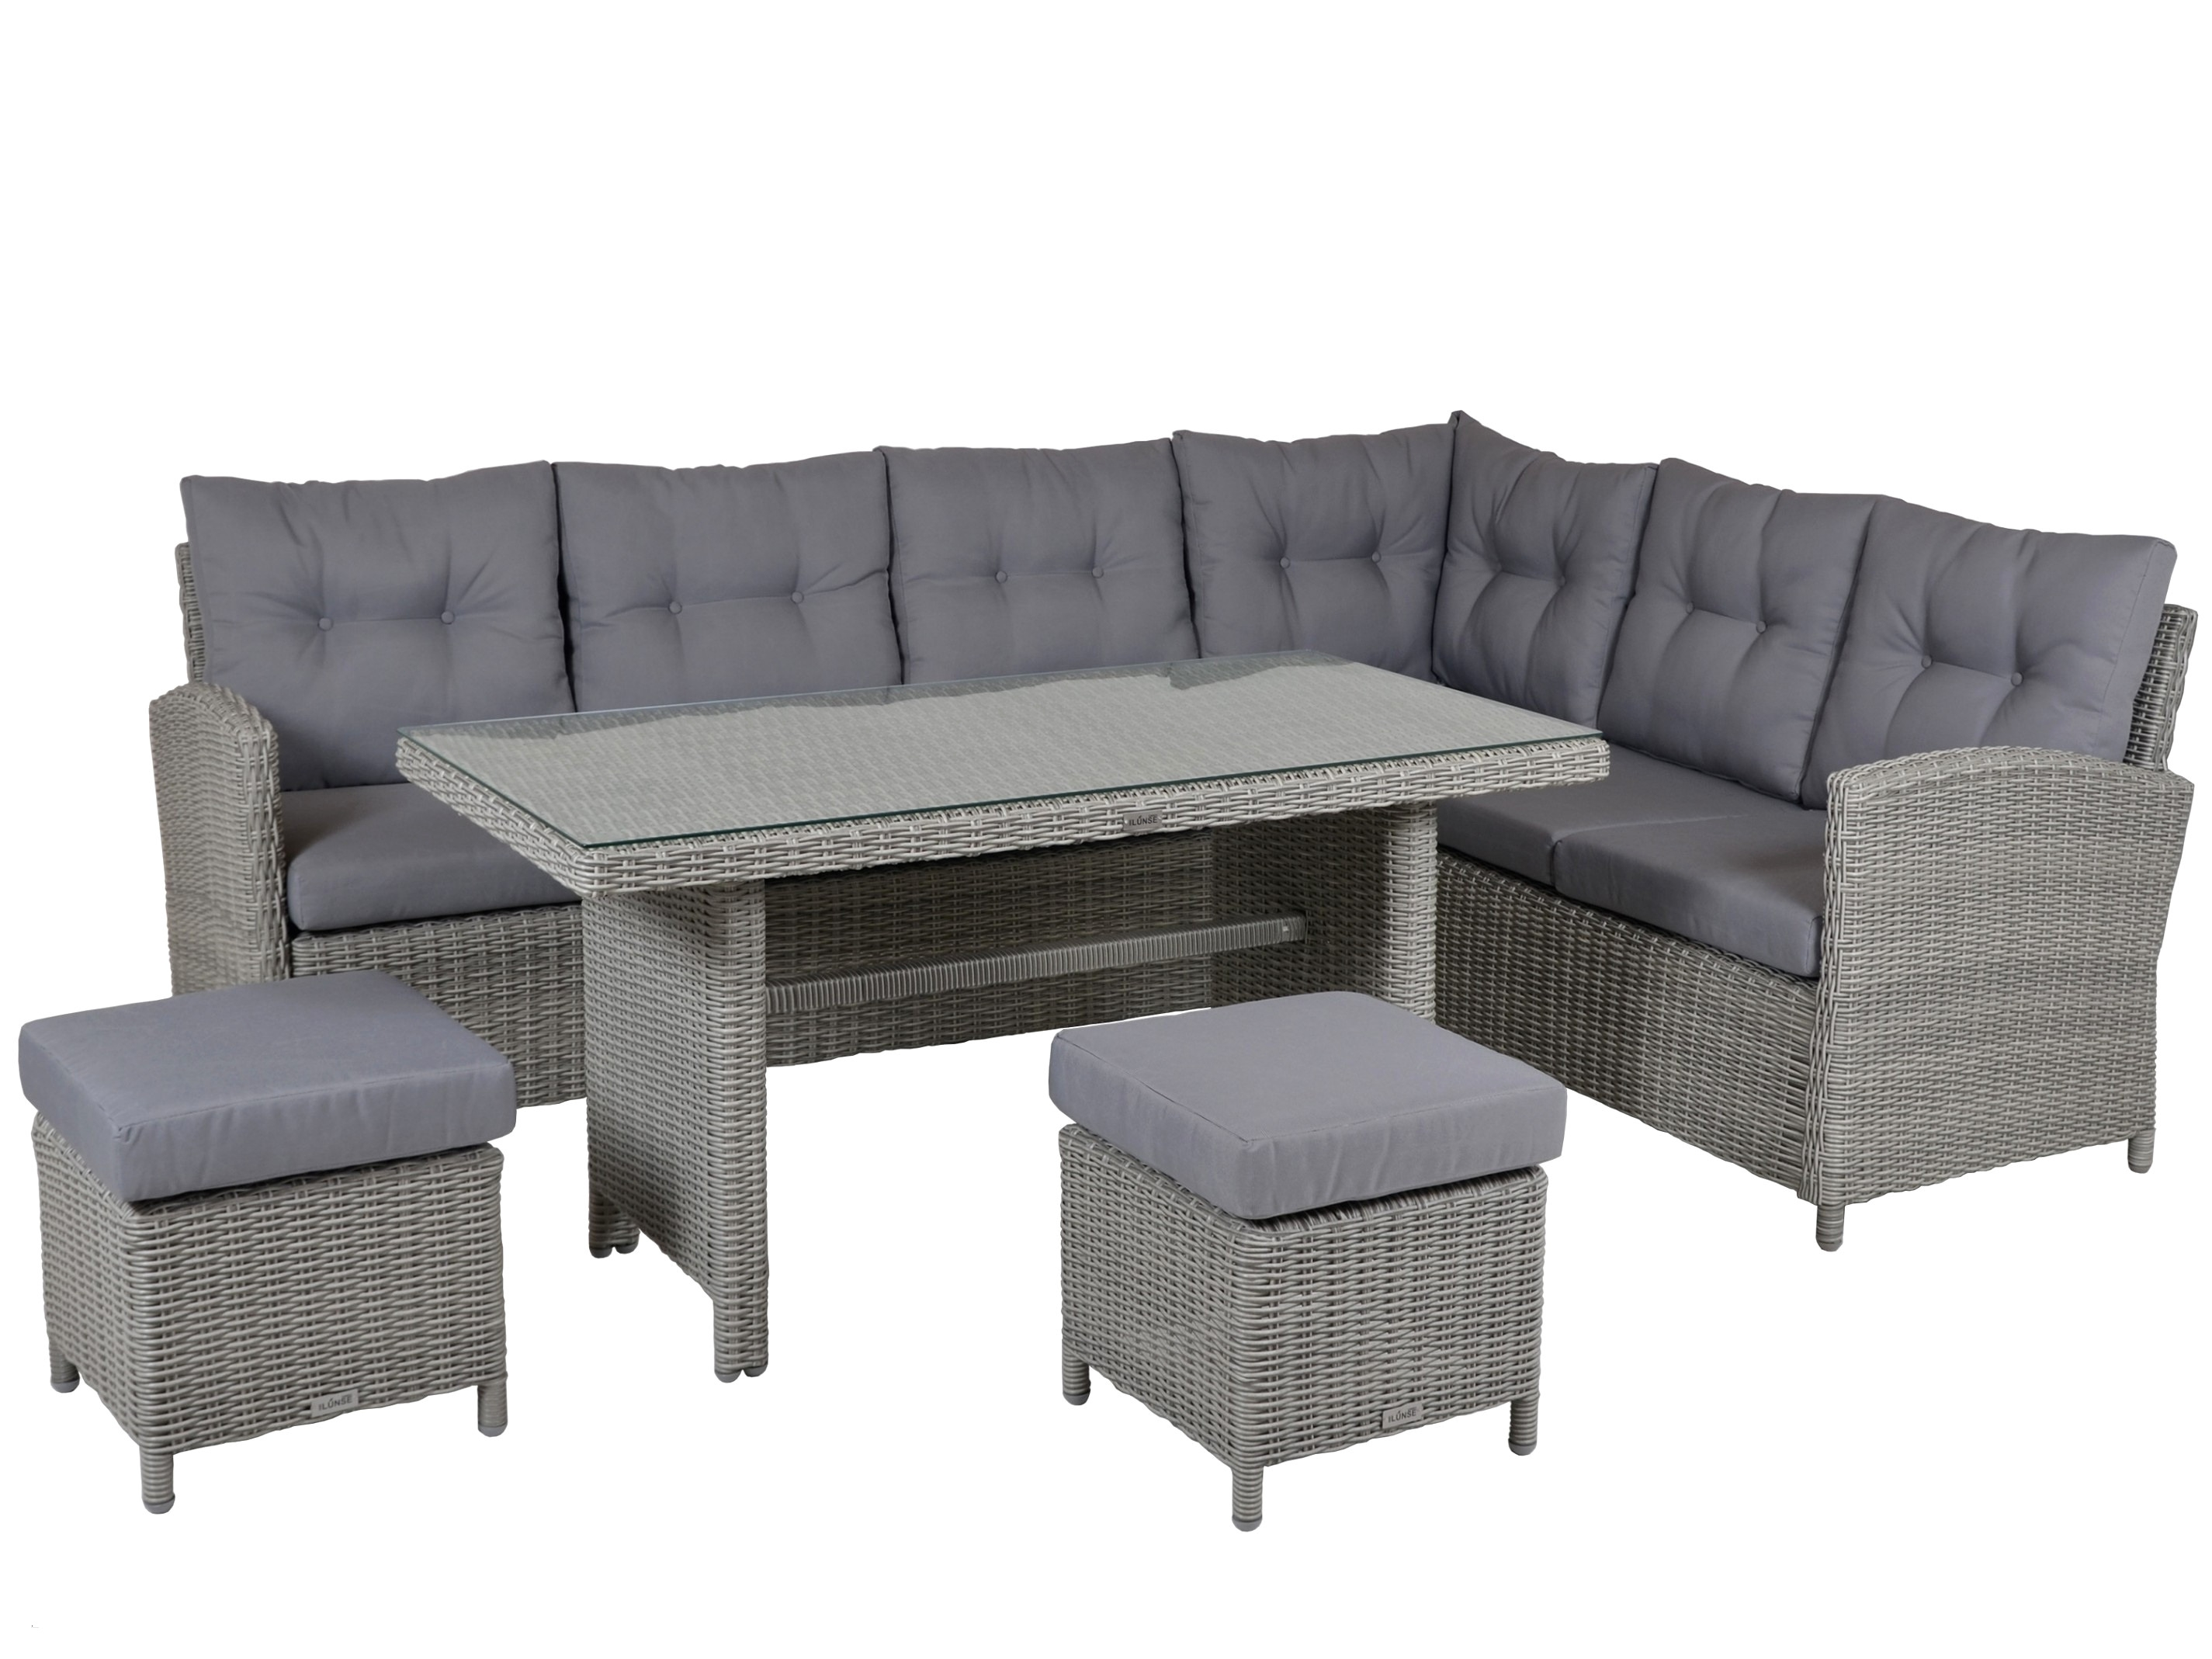 modular outdoor furniture elegant lovely mayfair outdoor furniture livingpositivebydesign